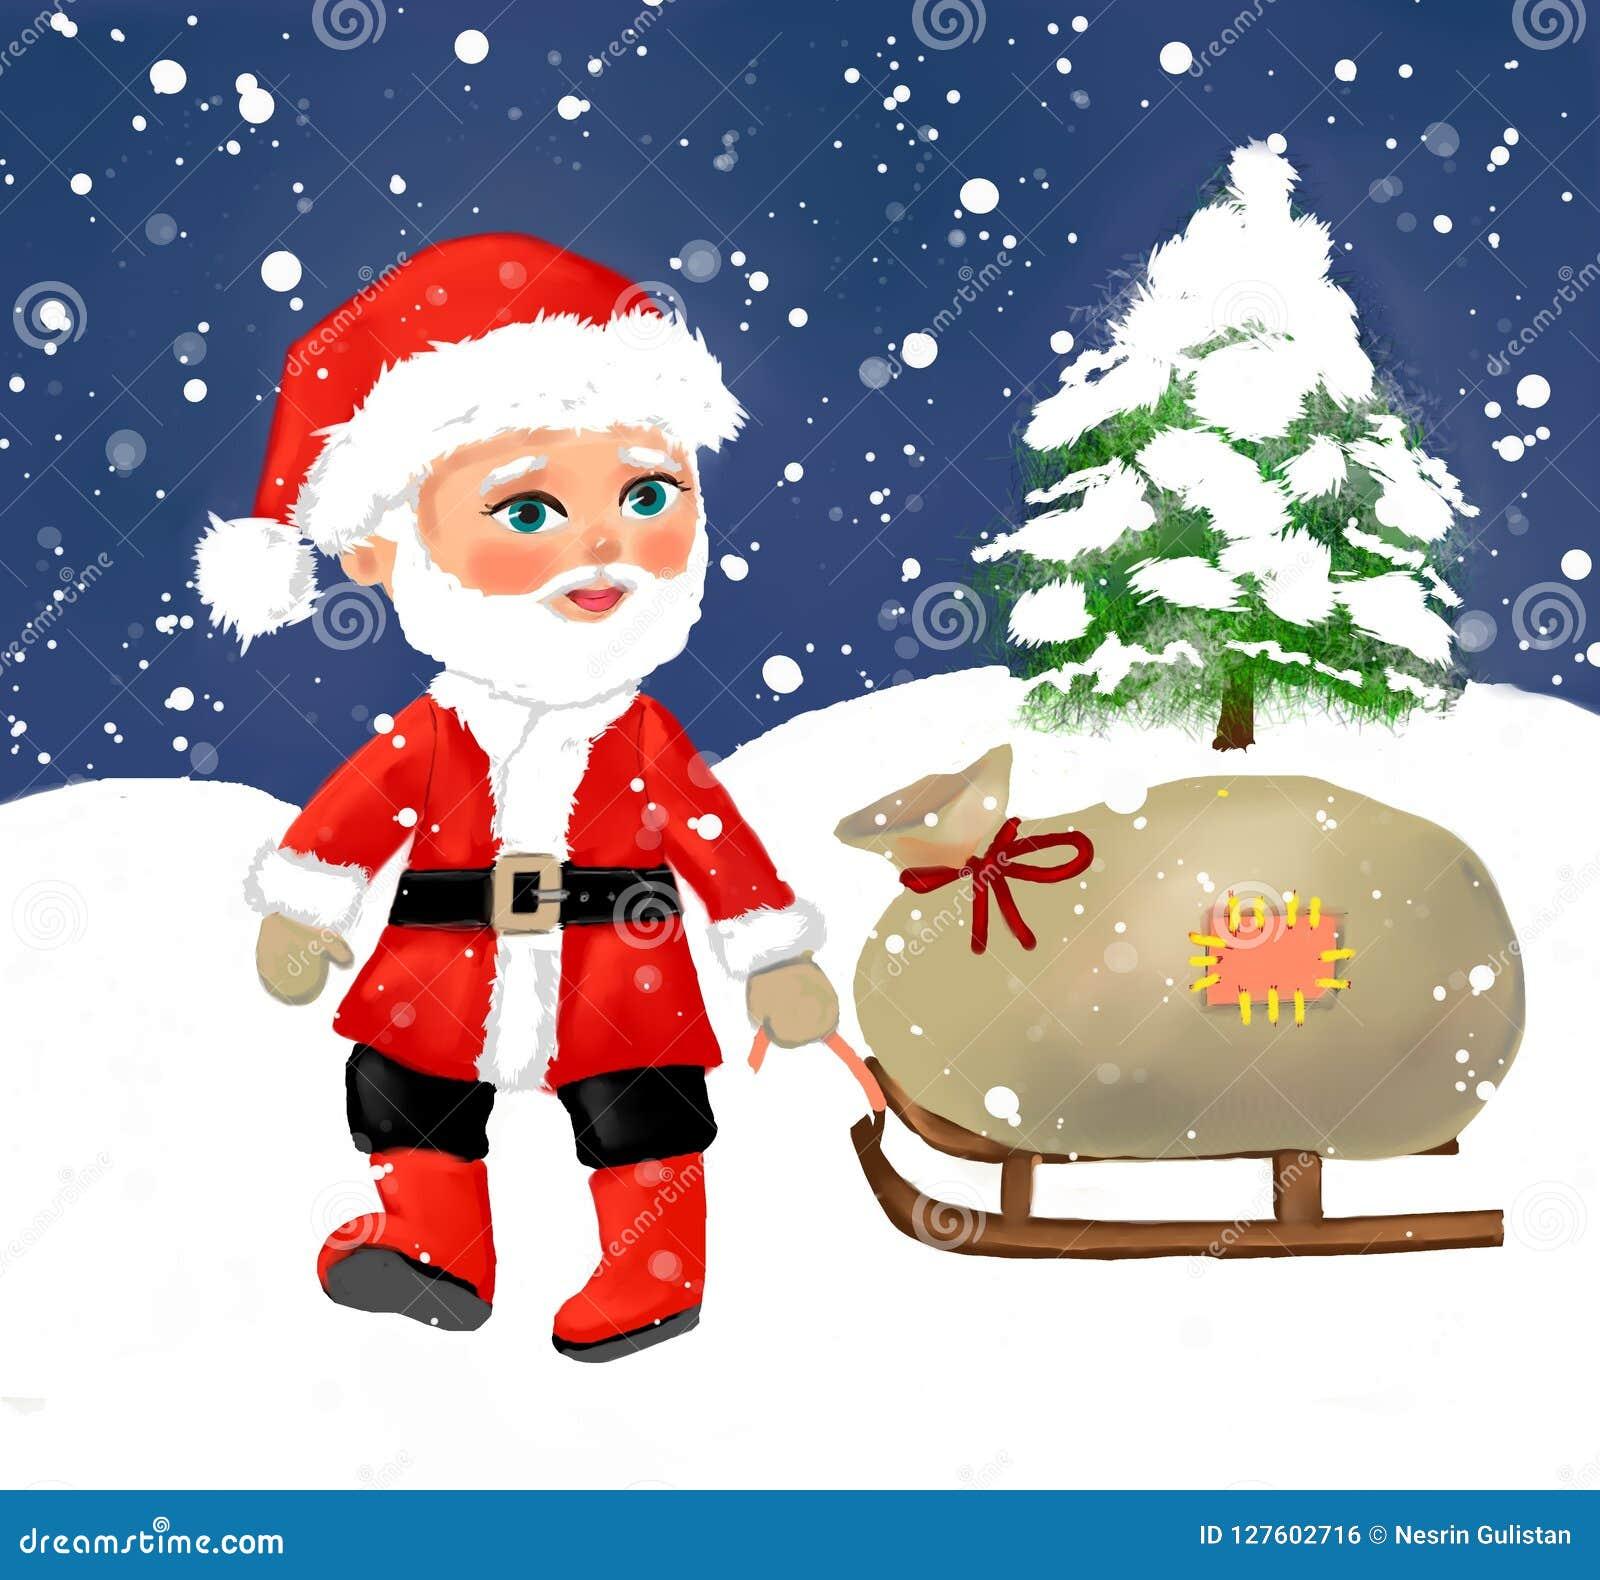 Christmas Season 2019 2019 Santa Claus New Year Happy New Year, Santa Claus Christmas